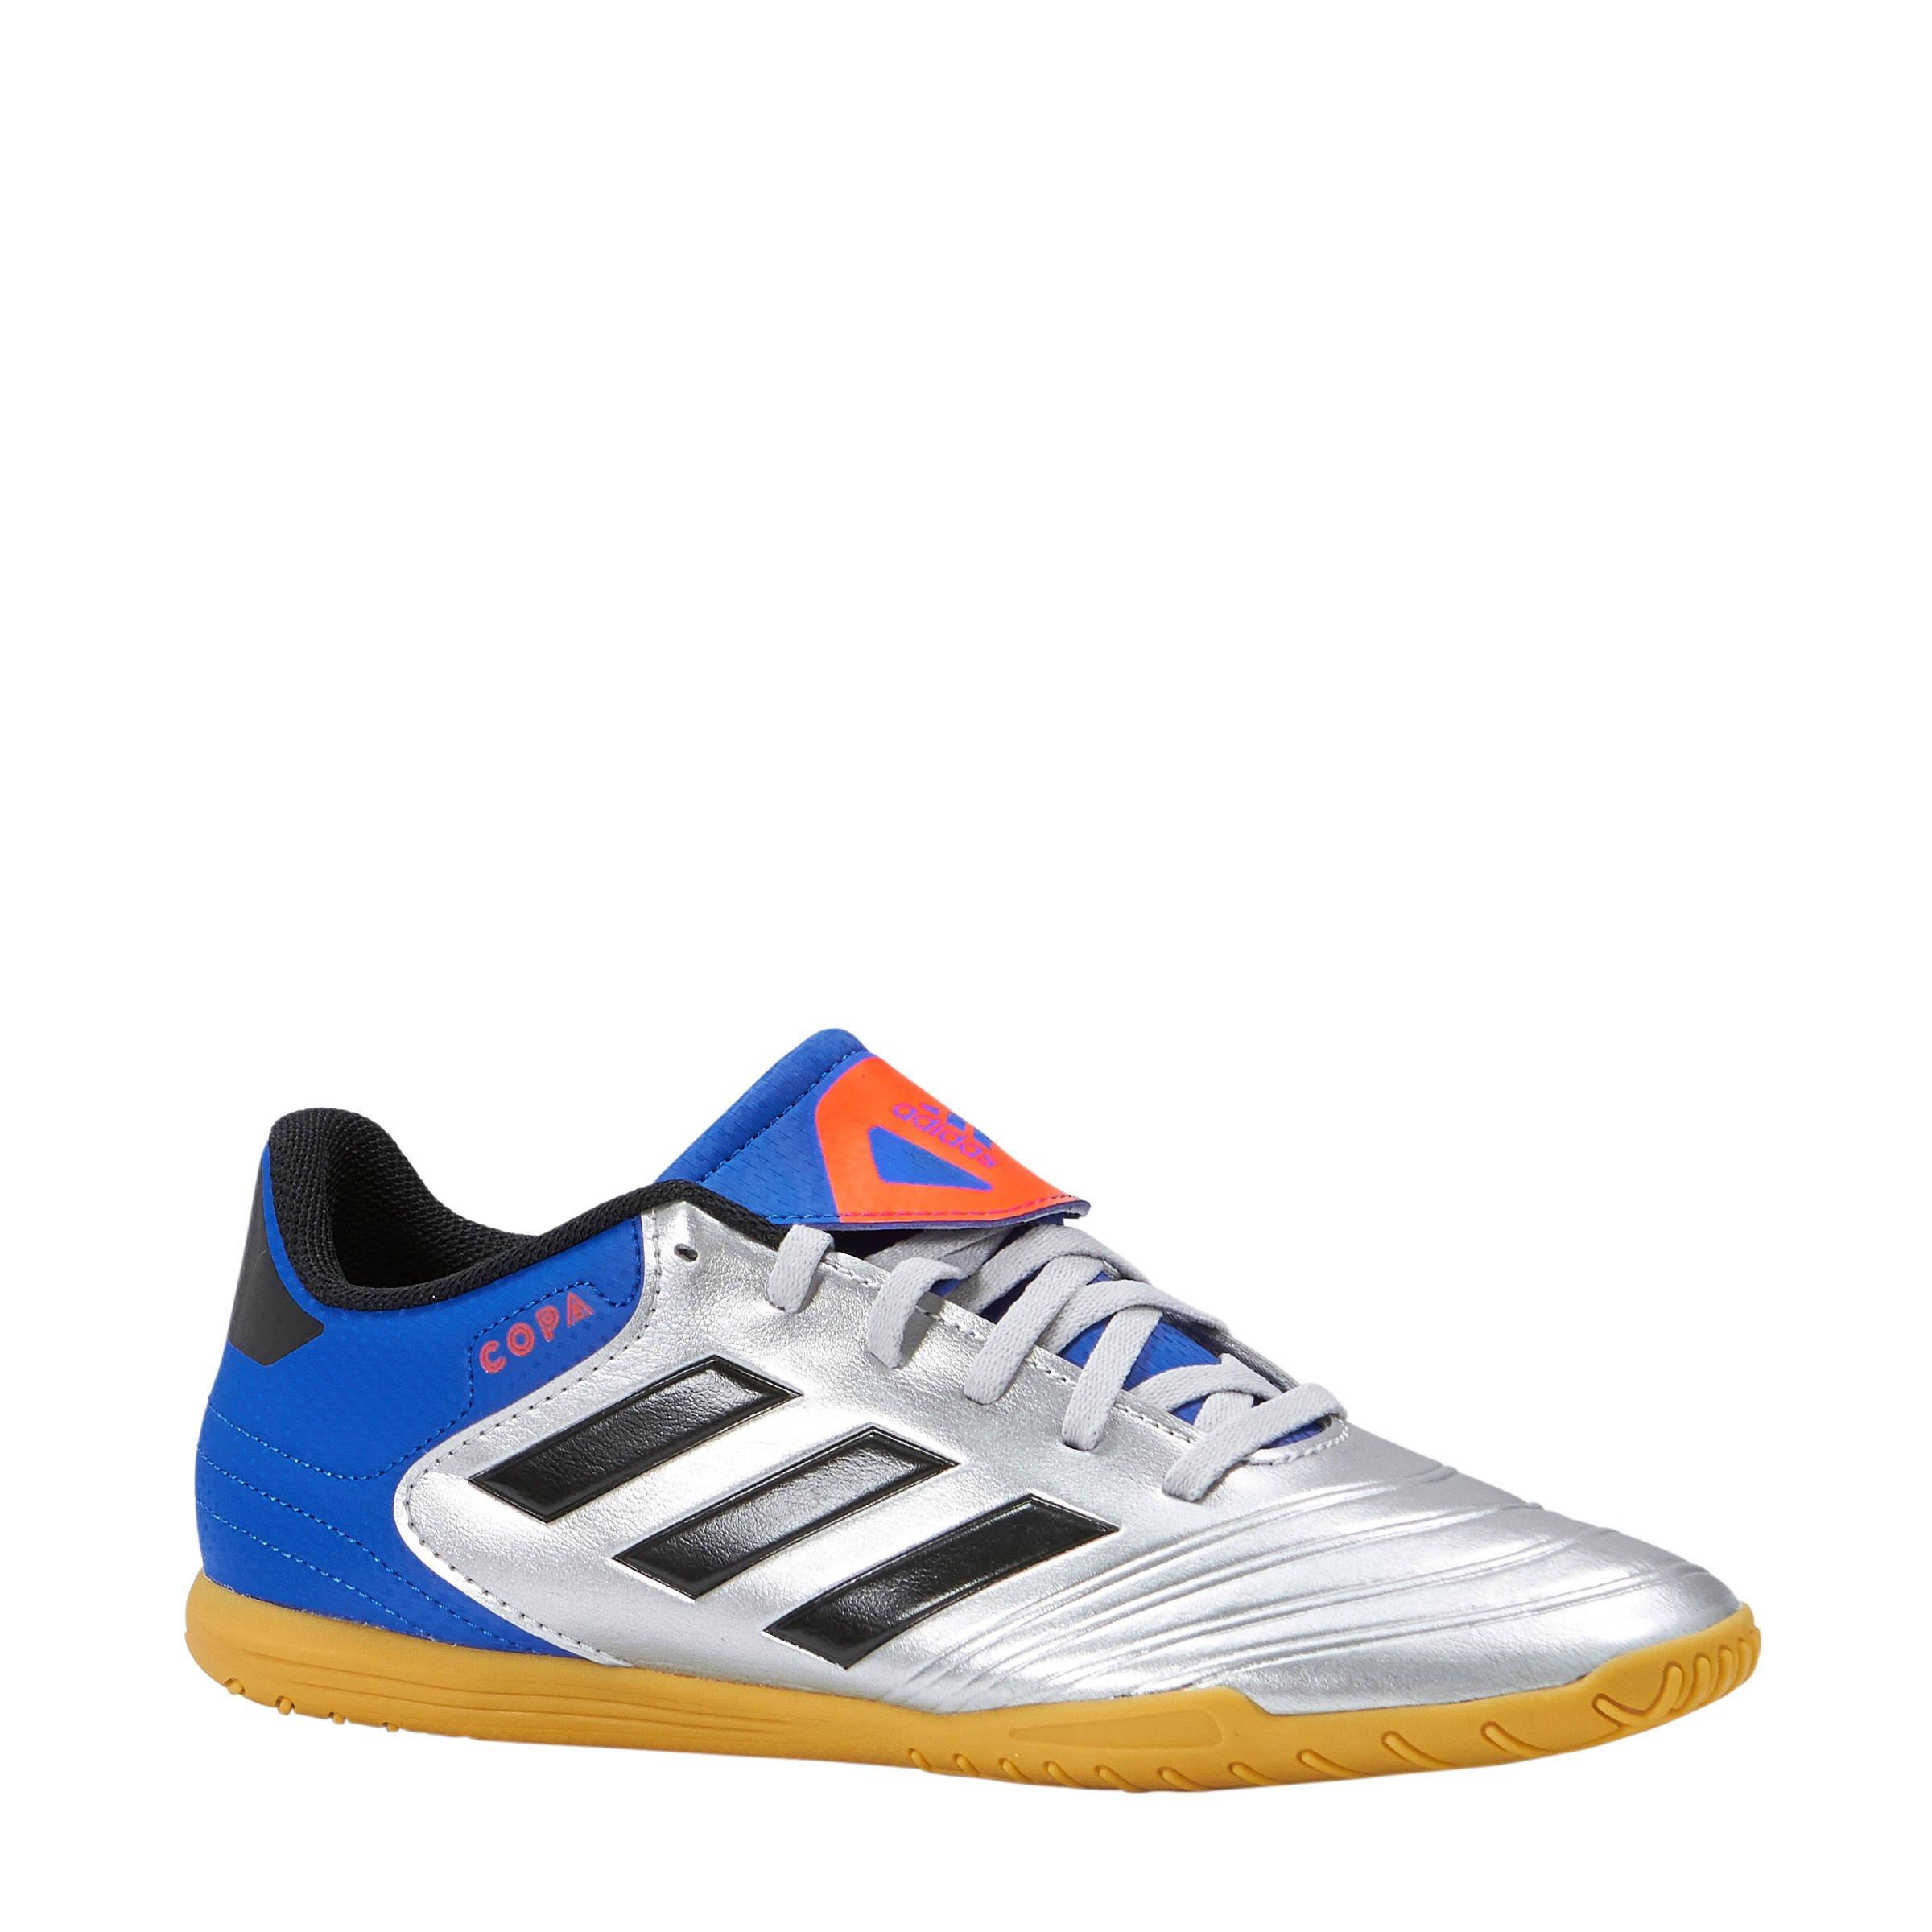 0a07046ceadb52 adidas-performance-copa-tango-18-4-in-zaalvoetbalschoenen-zilver-zilver-4059811863720.jpg